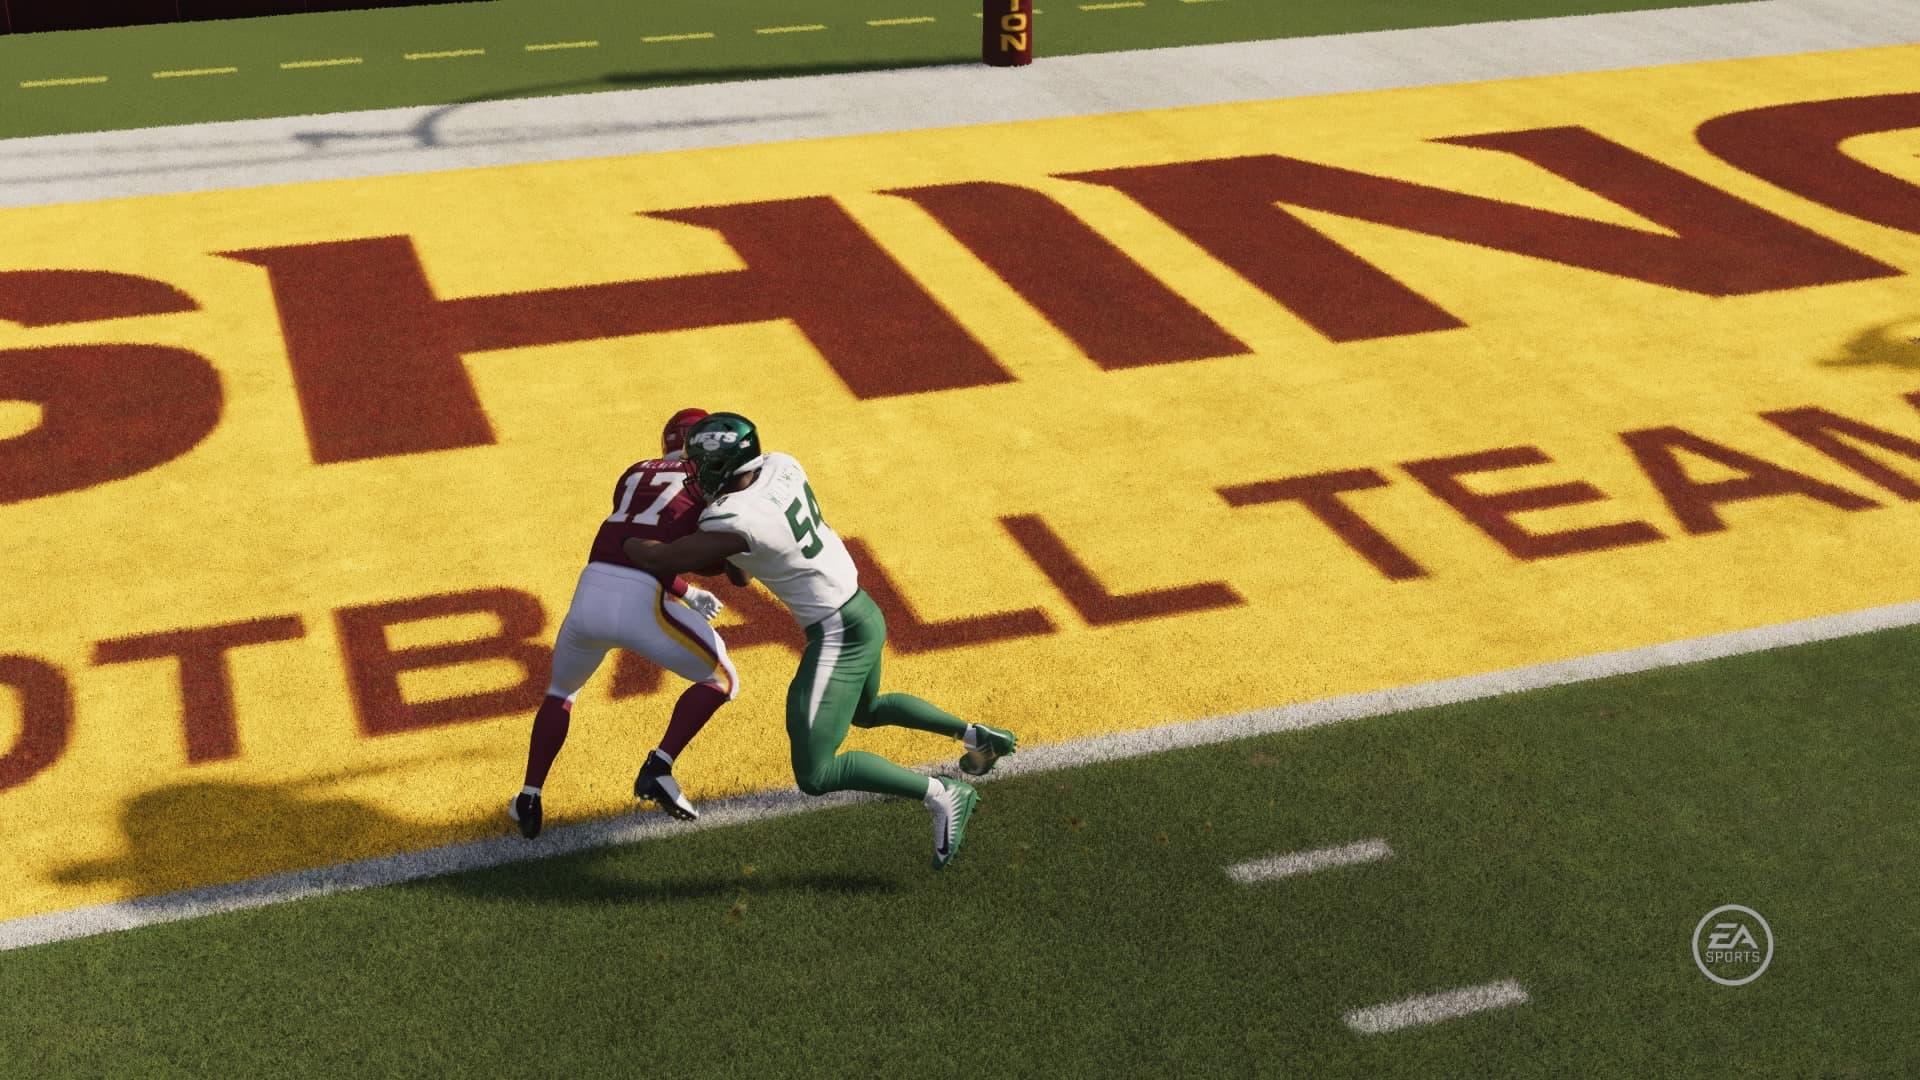 Madden NFL 21 Xbox Series X & S